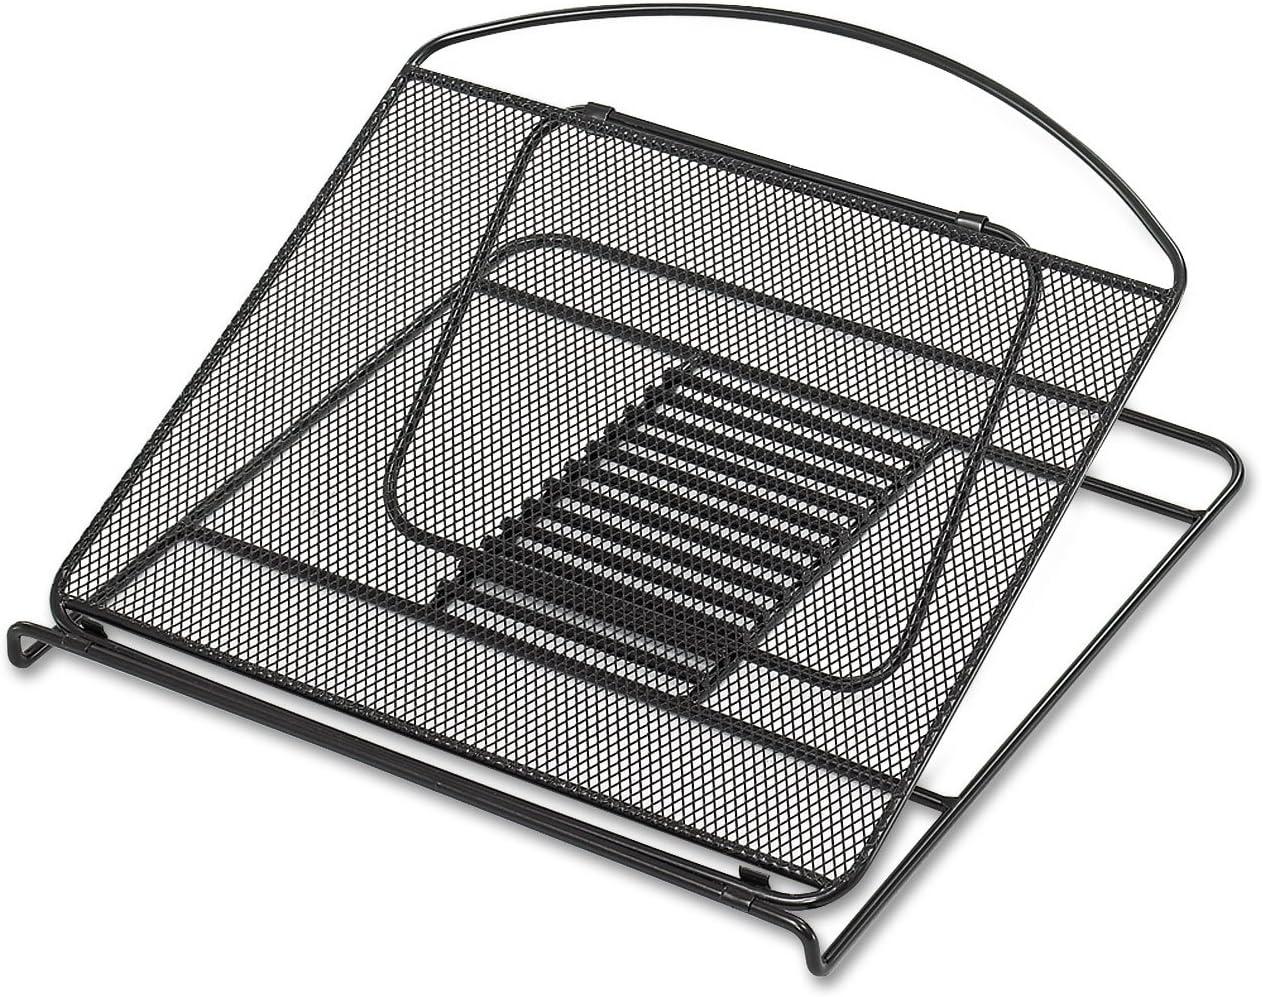 SAF2161BL - Safco Onyx Mesh Laptop Stand